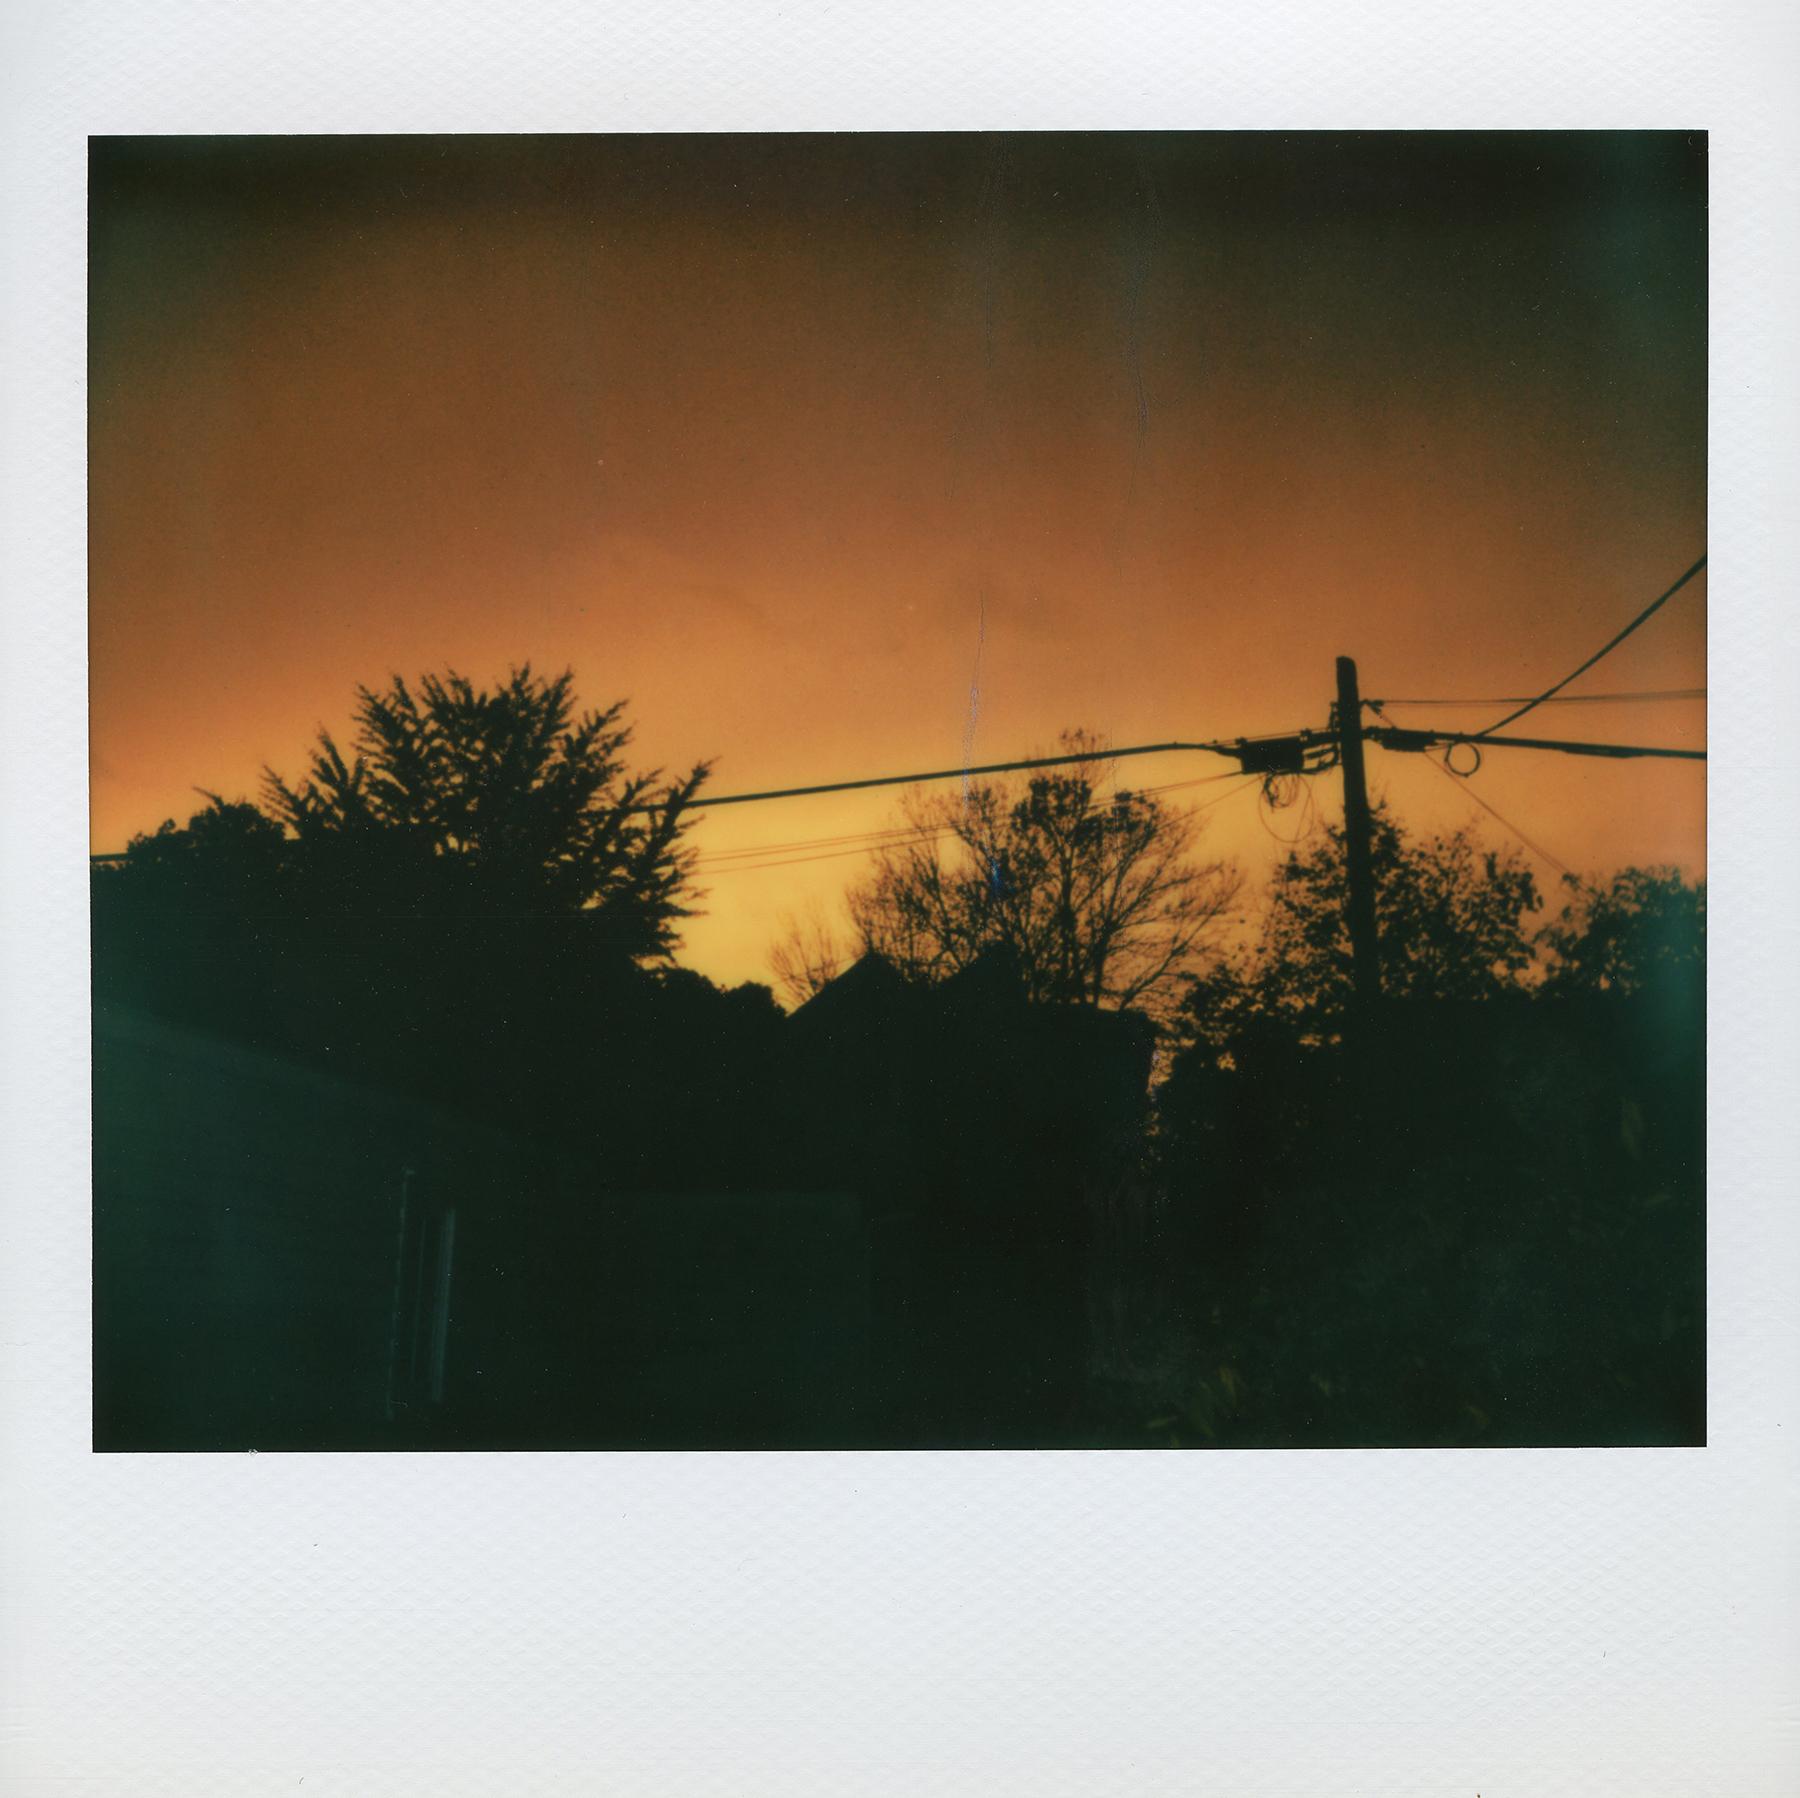 Sunrise or Sunset | Fuji Instax 210 | Barbara Justice